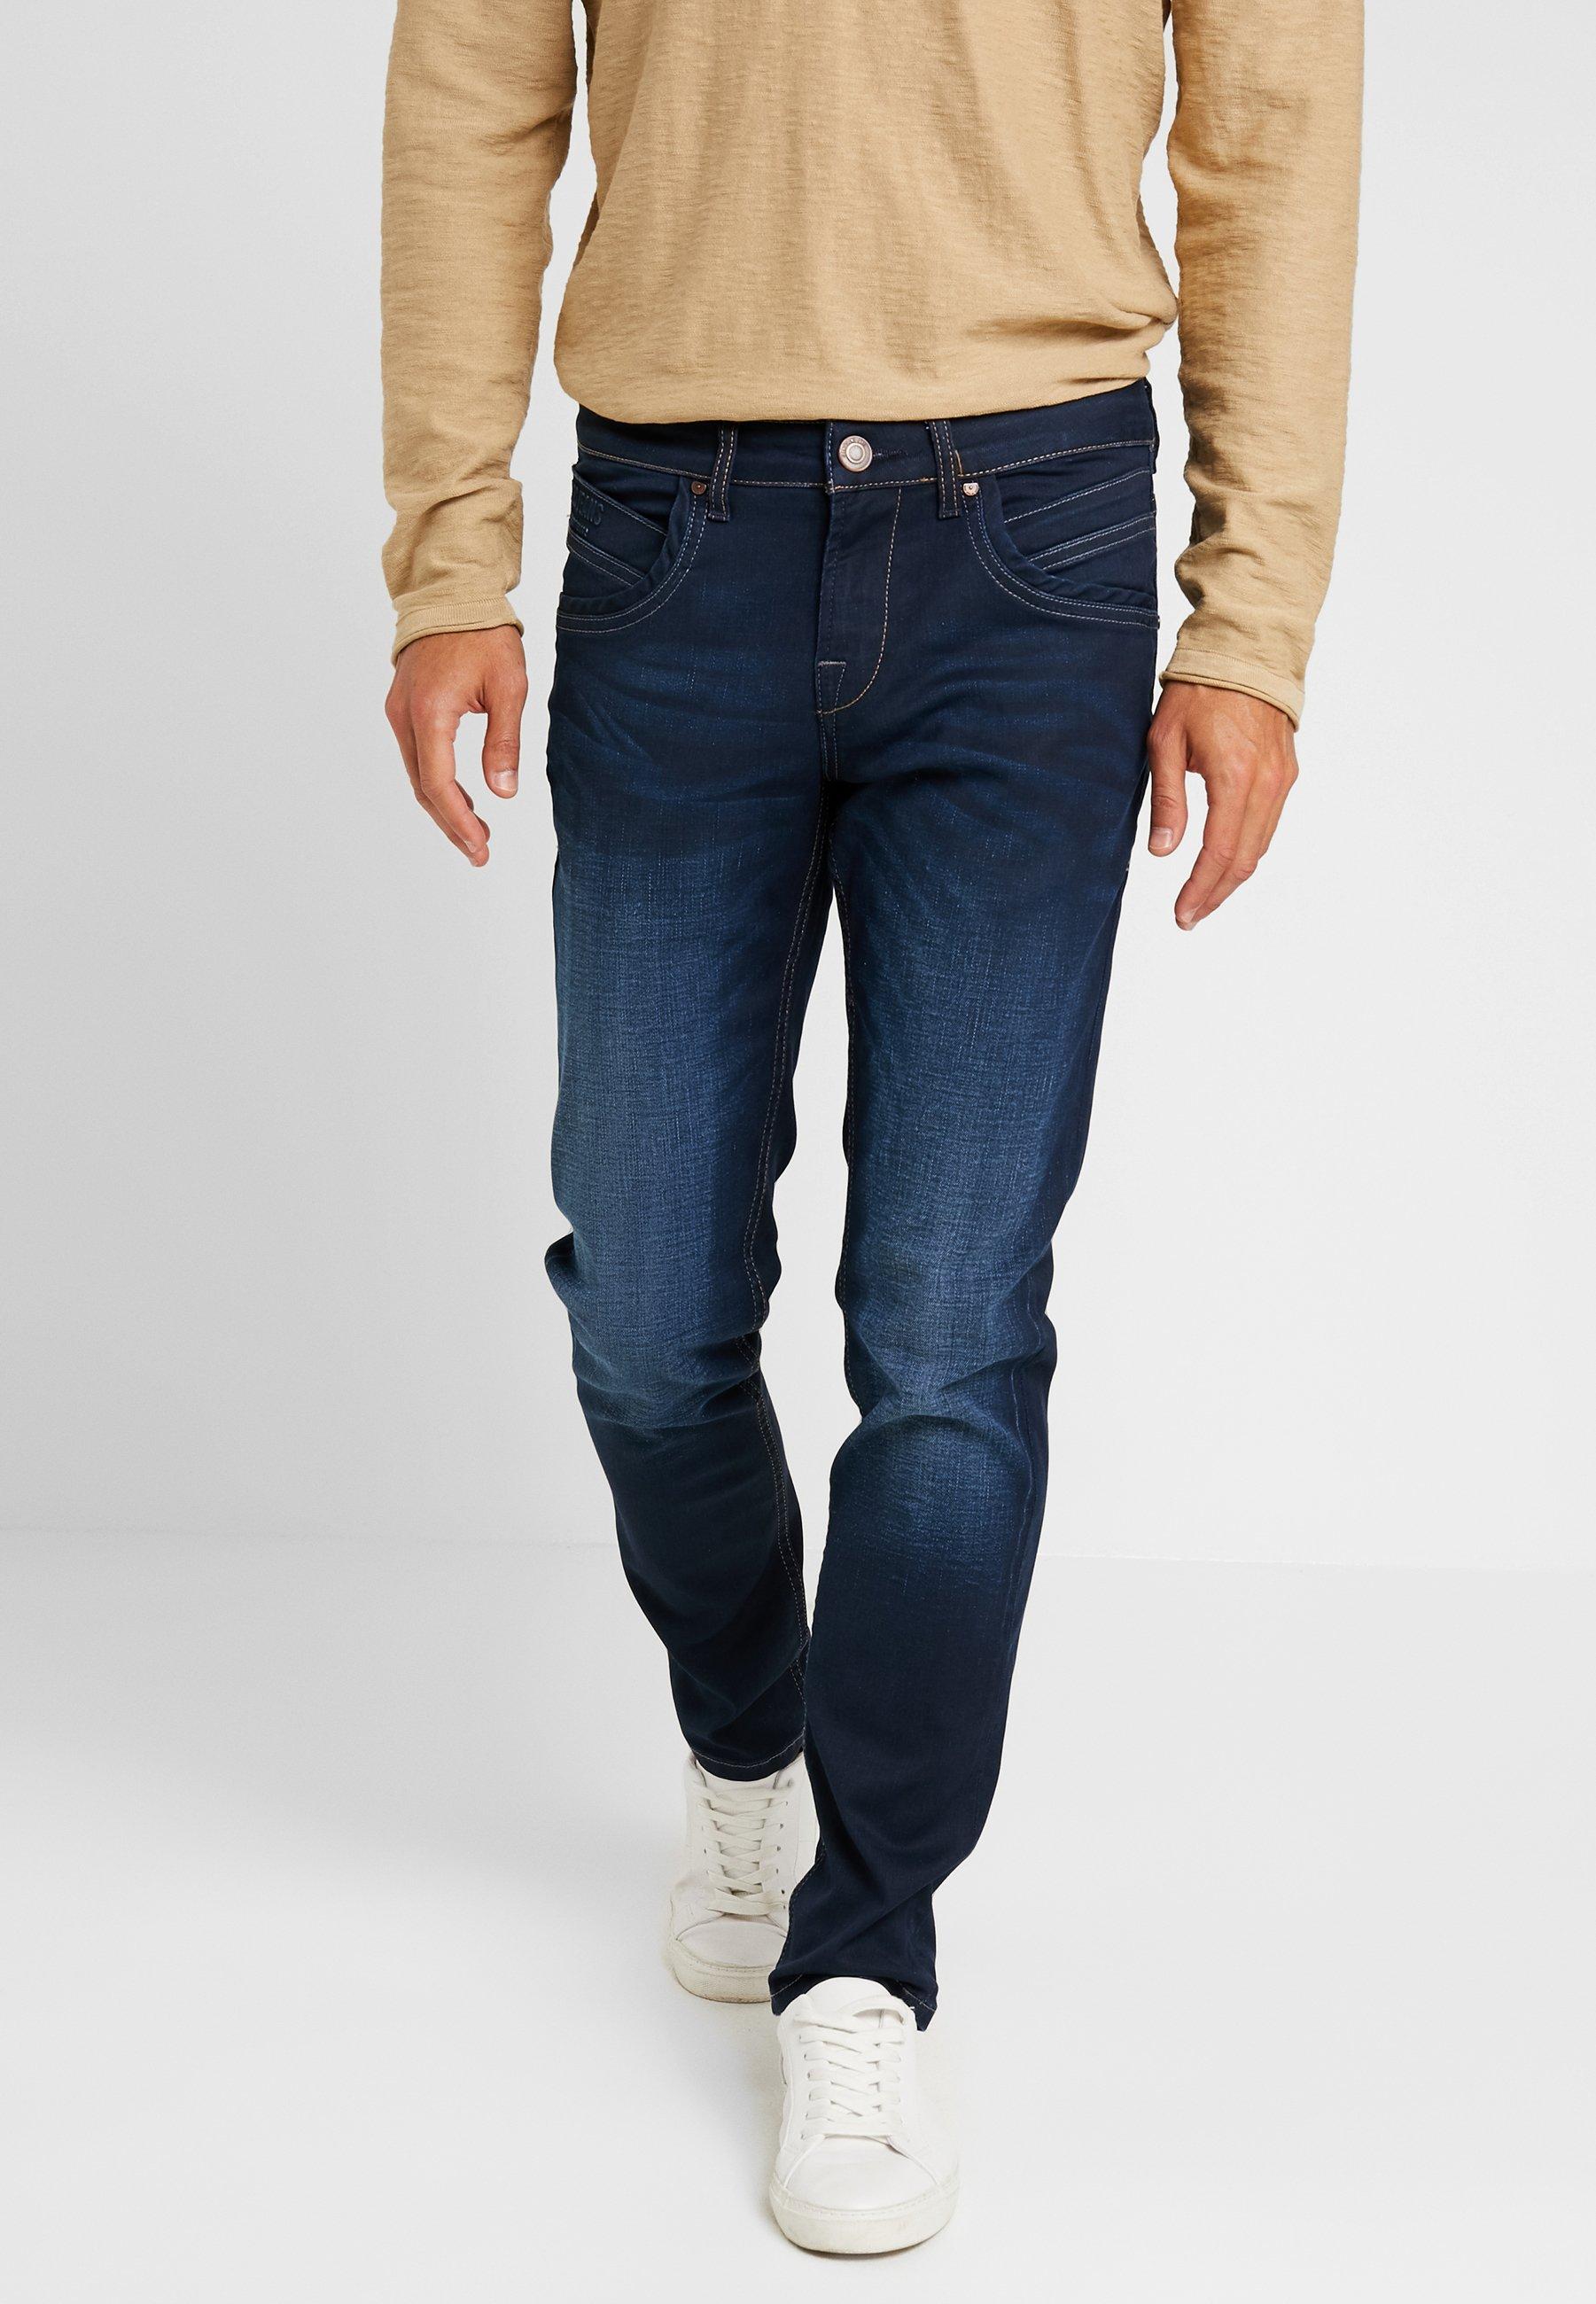 Dark Droit HenlowJean Cars Blue Jeans b7yf6g